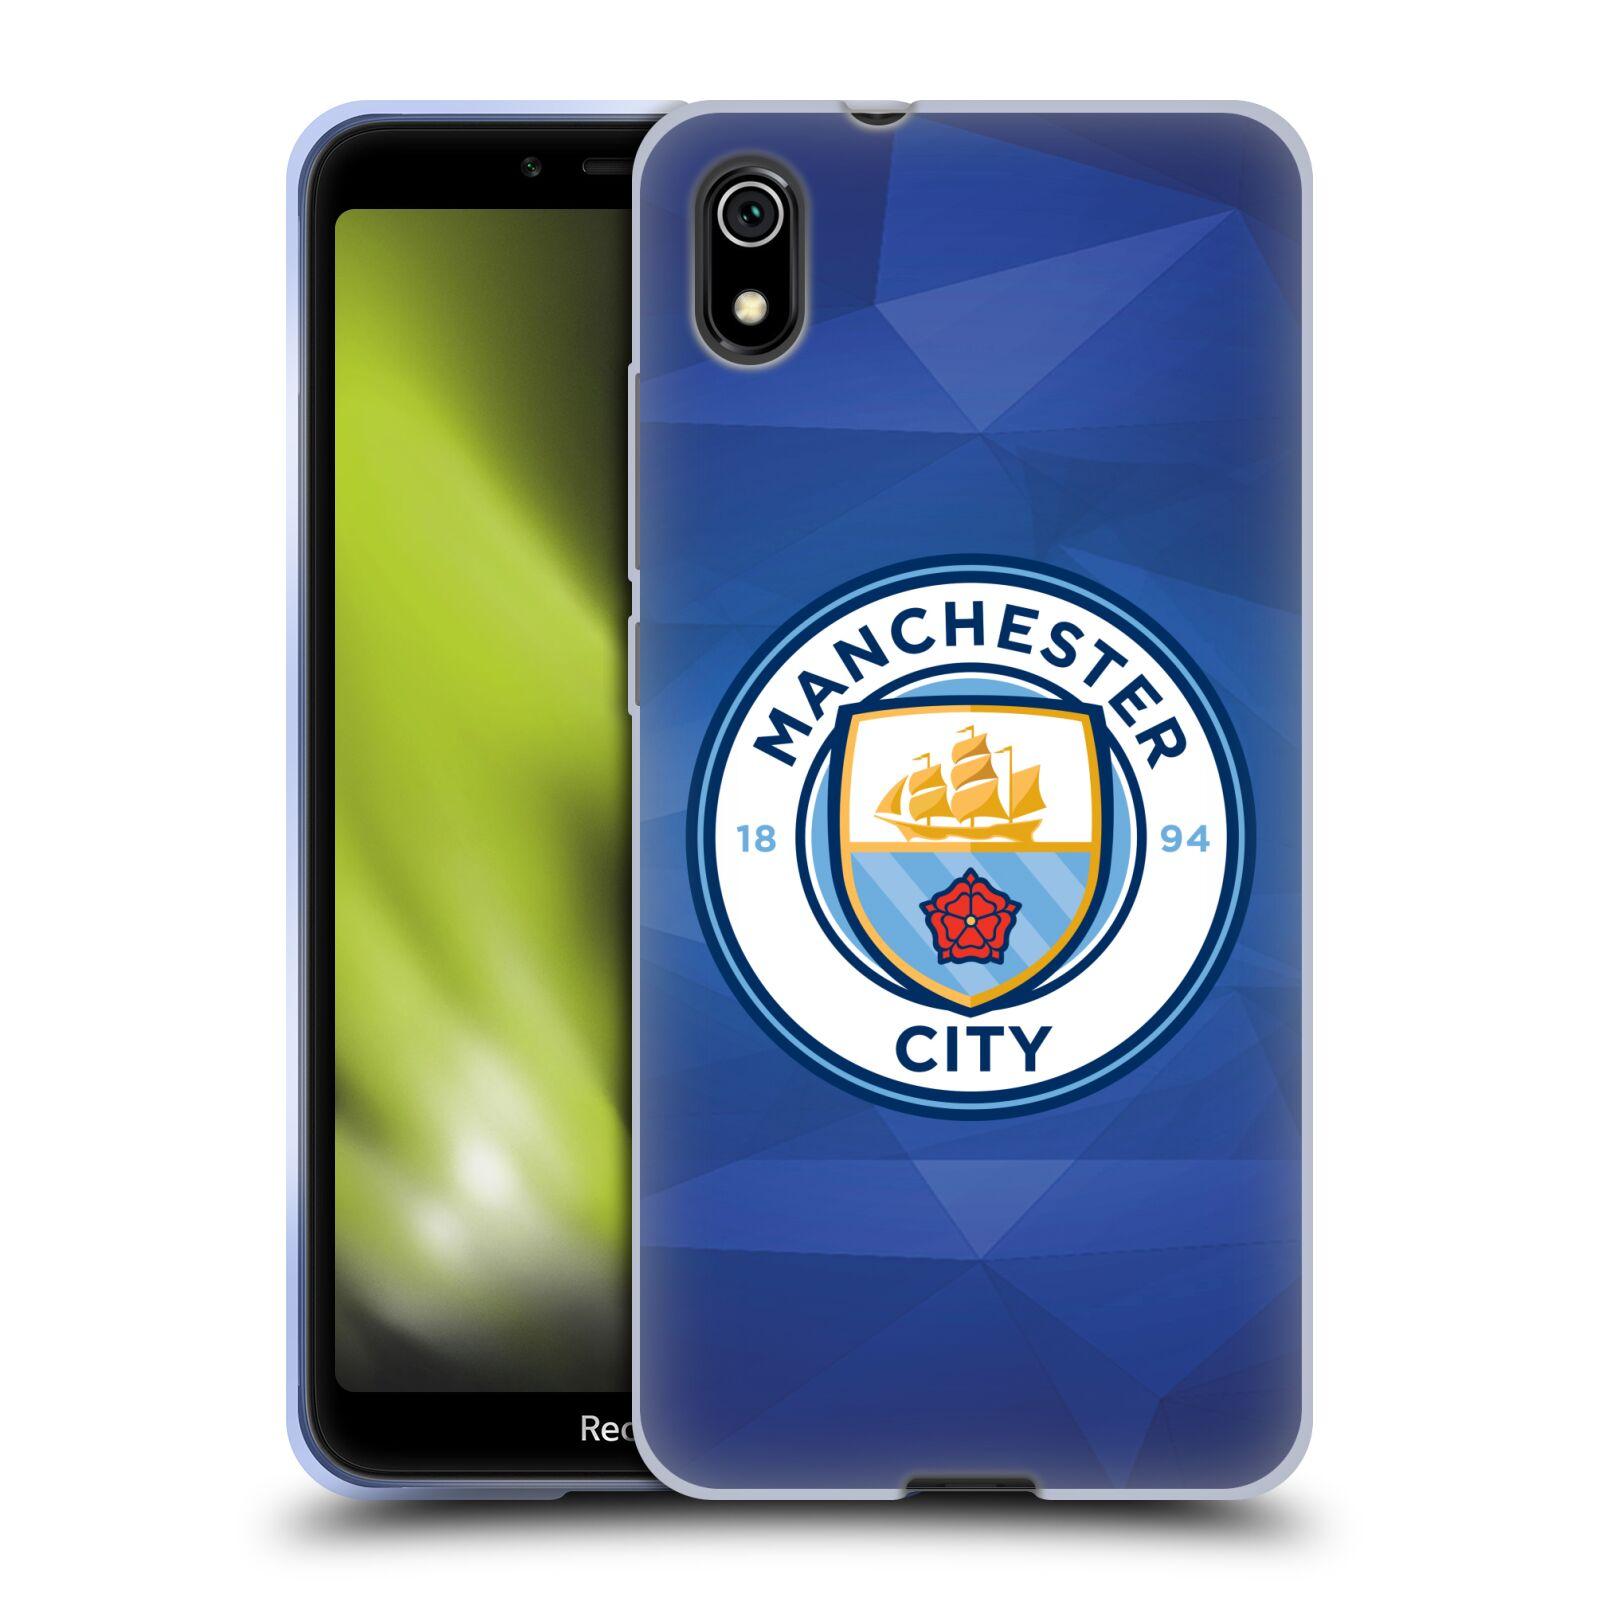 Silikonové pouzdro na mobil Redmi 7A - Head Case - Manchester City FC - Modré nové logo